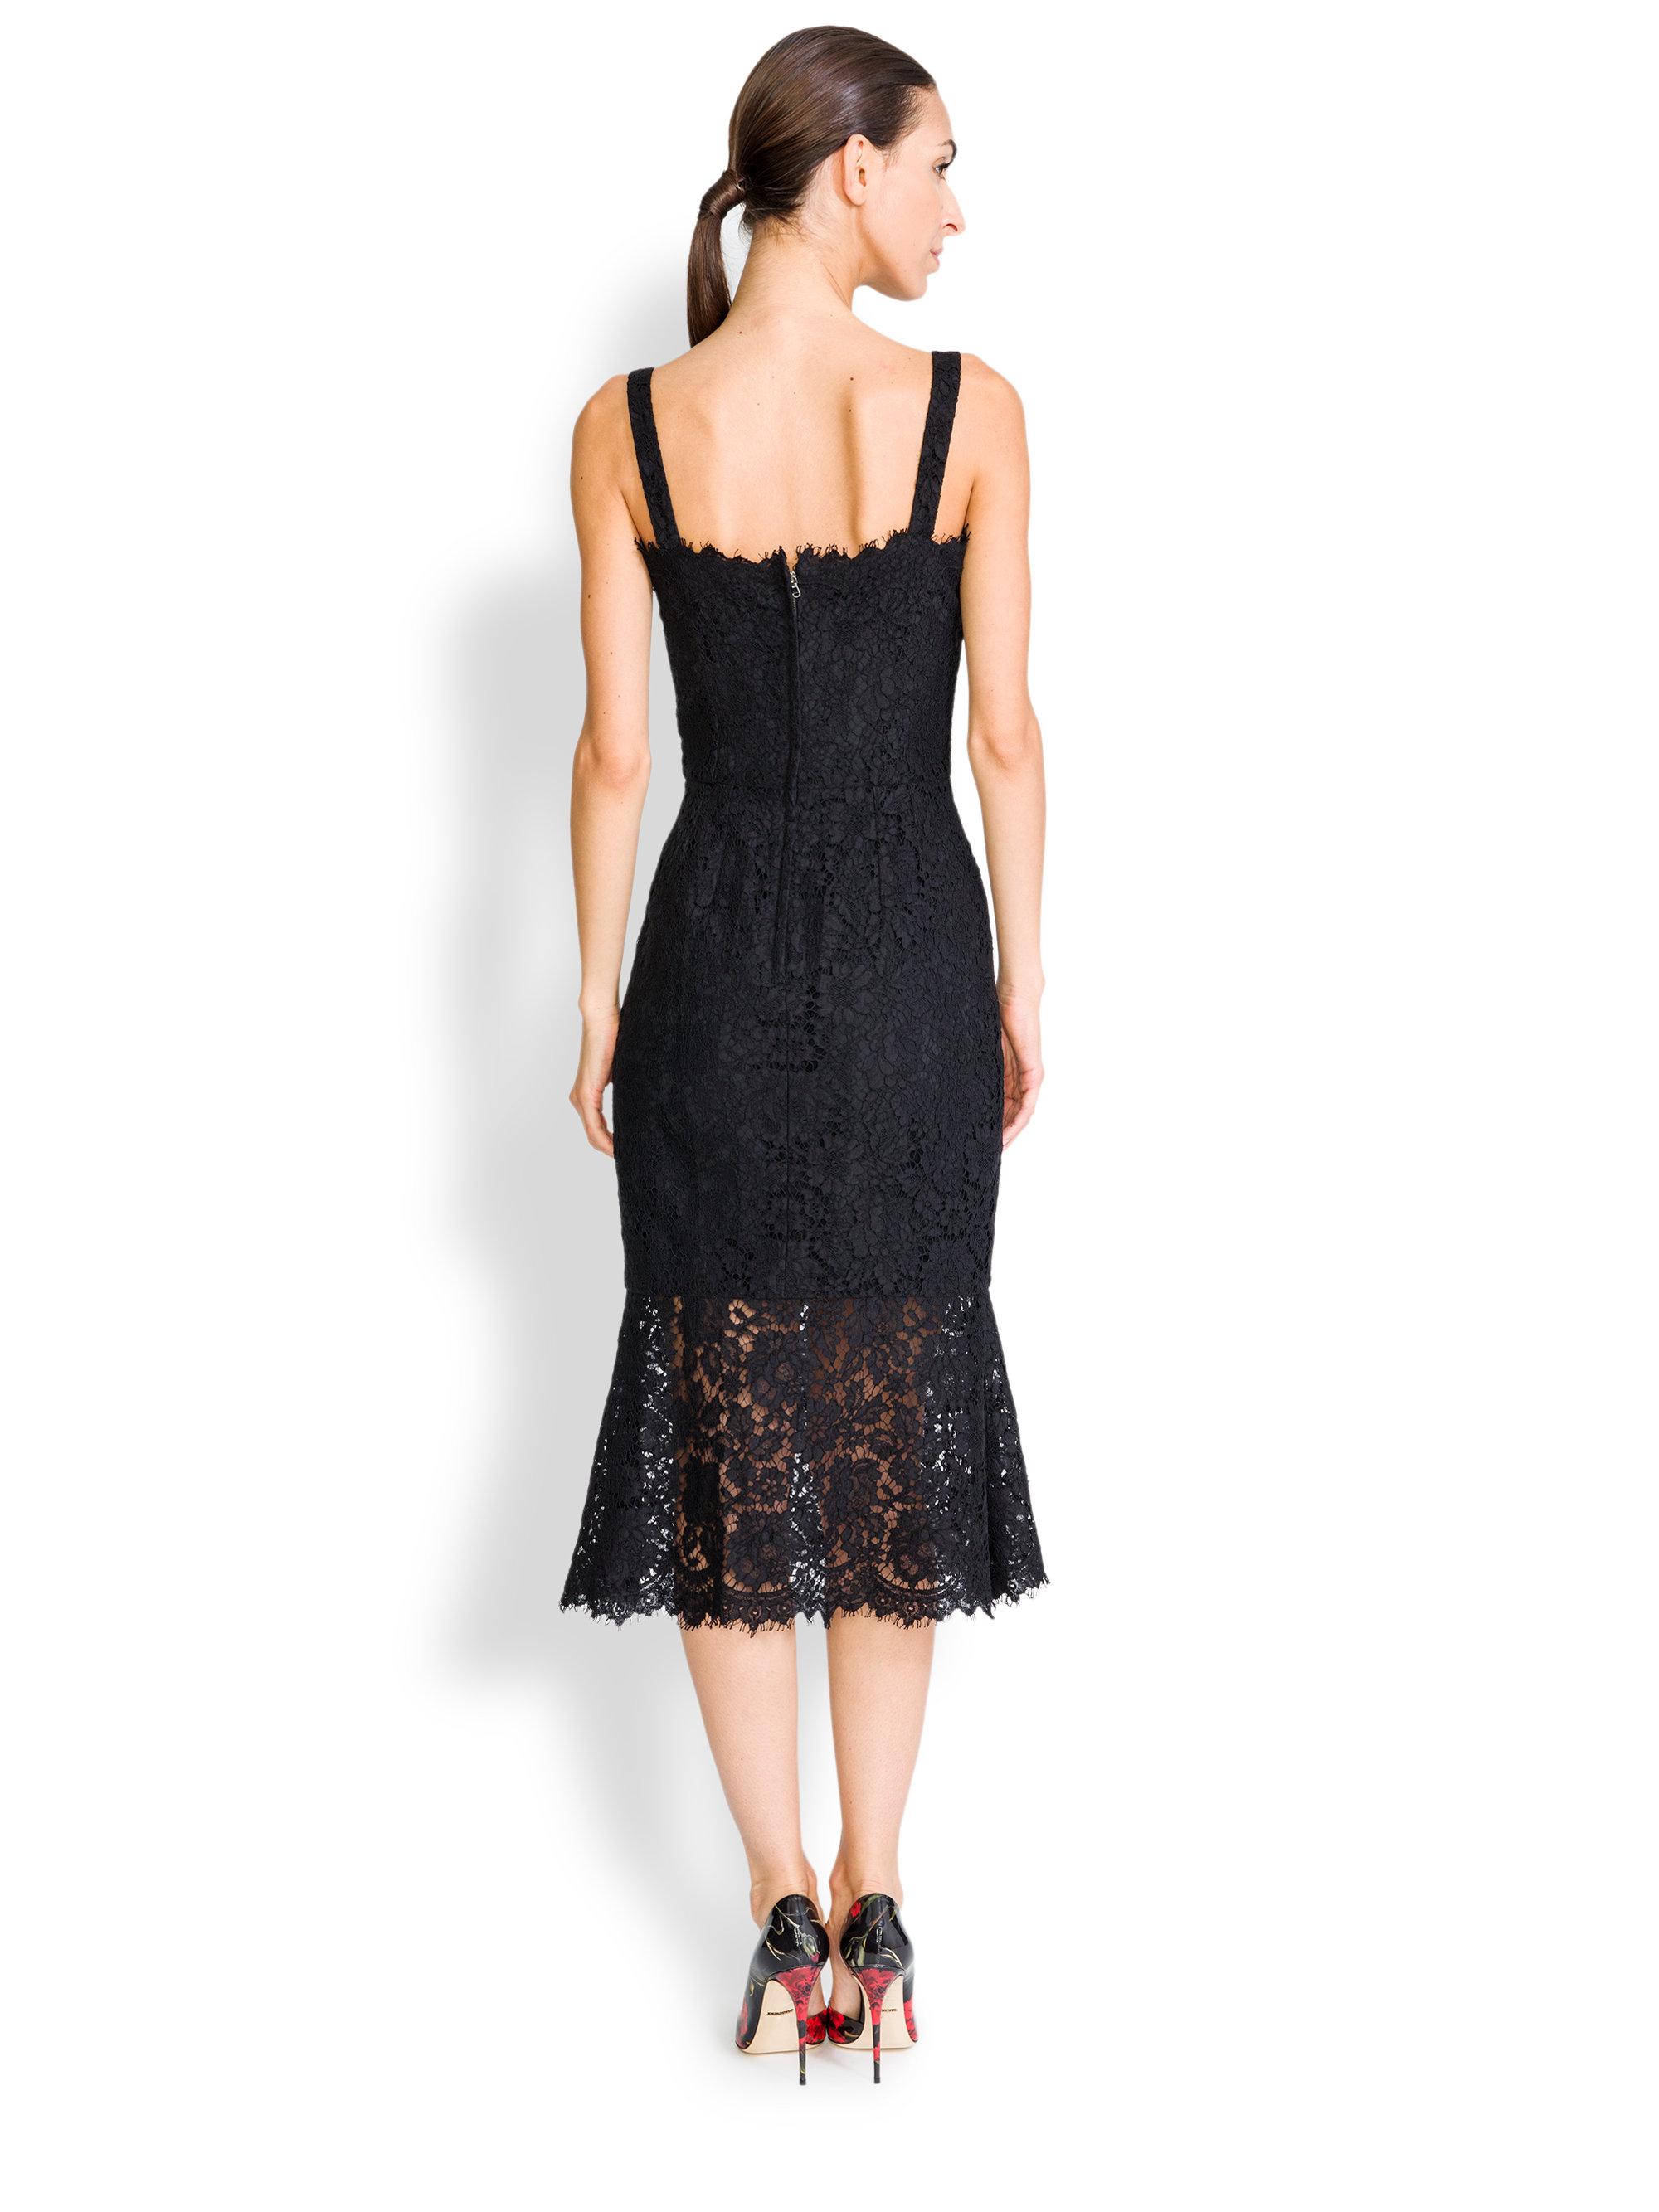 Lyst  Dolce  Gabbana Lace Corset Dress in Black